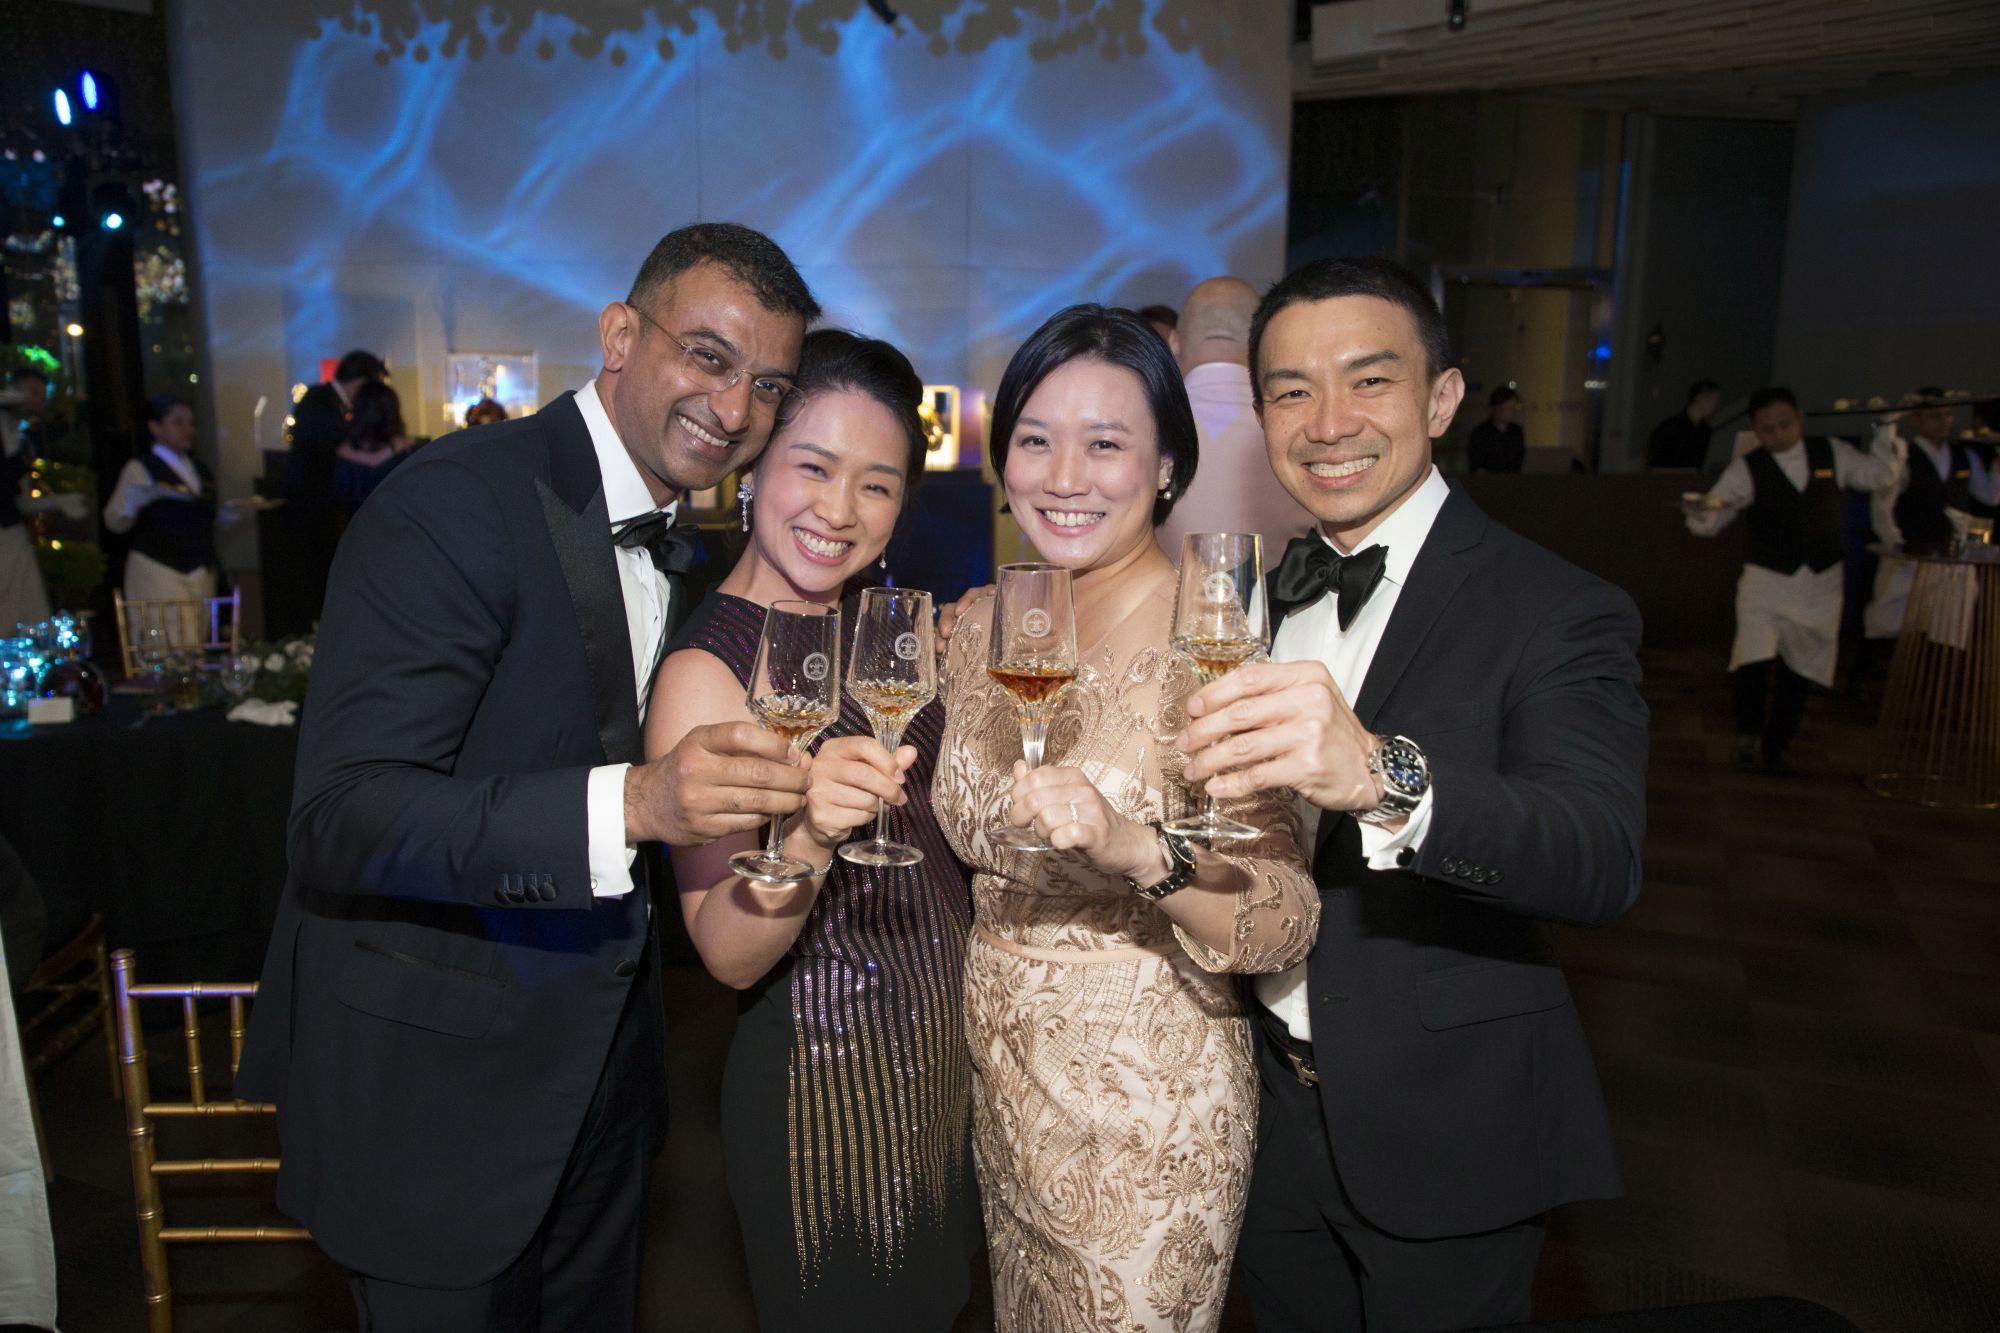 Ganesh Ramalingam, Lisa Gwee, Wendy Fun, Roland Chong